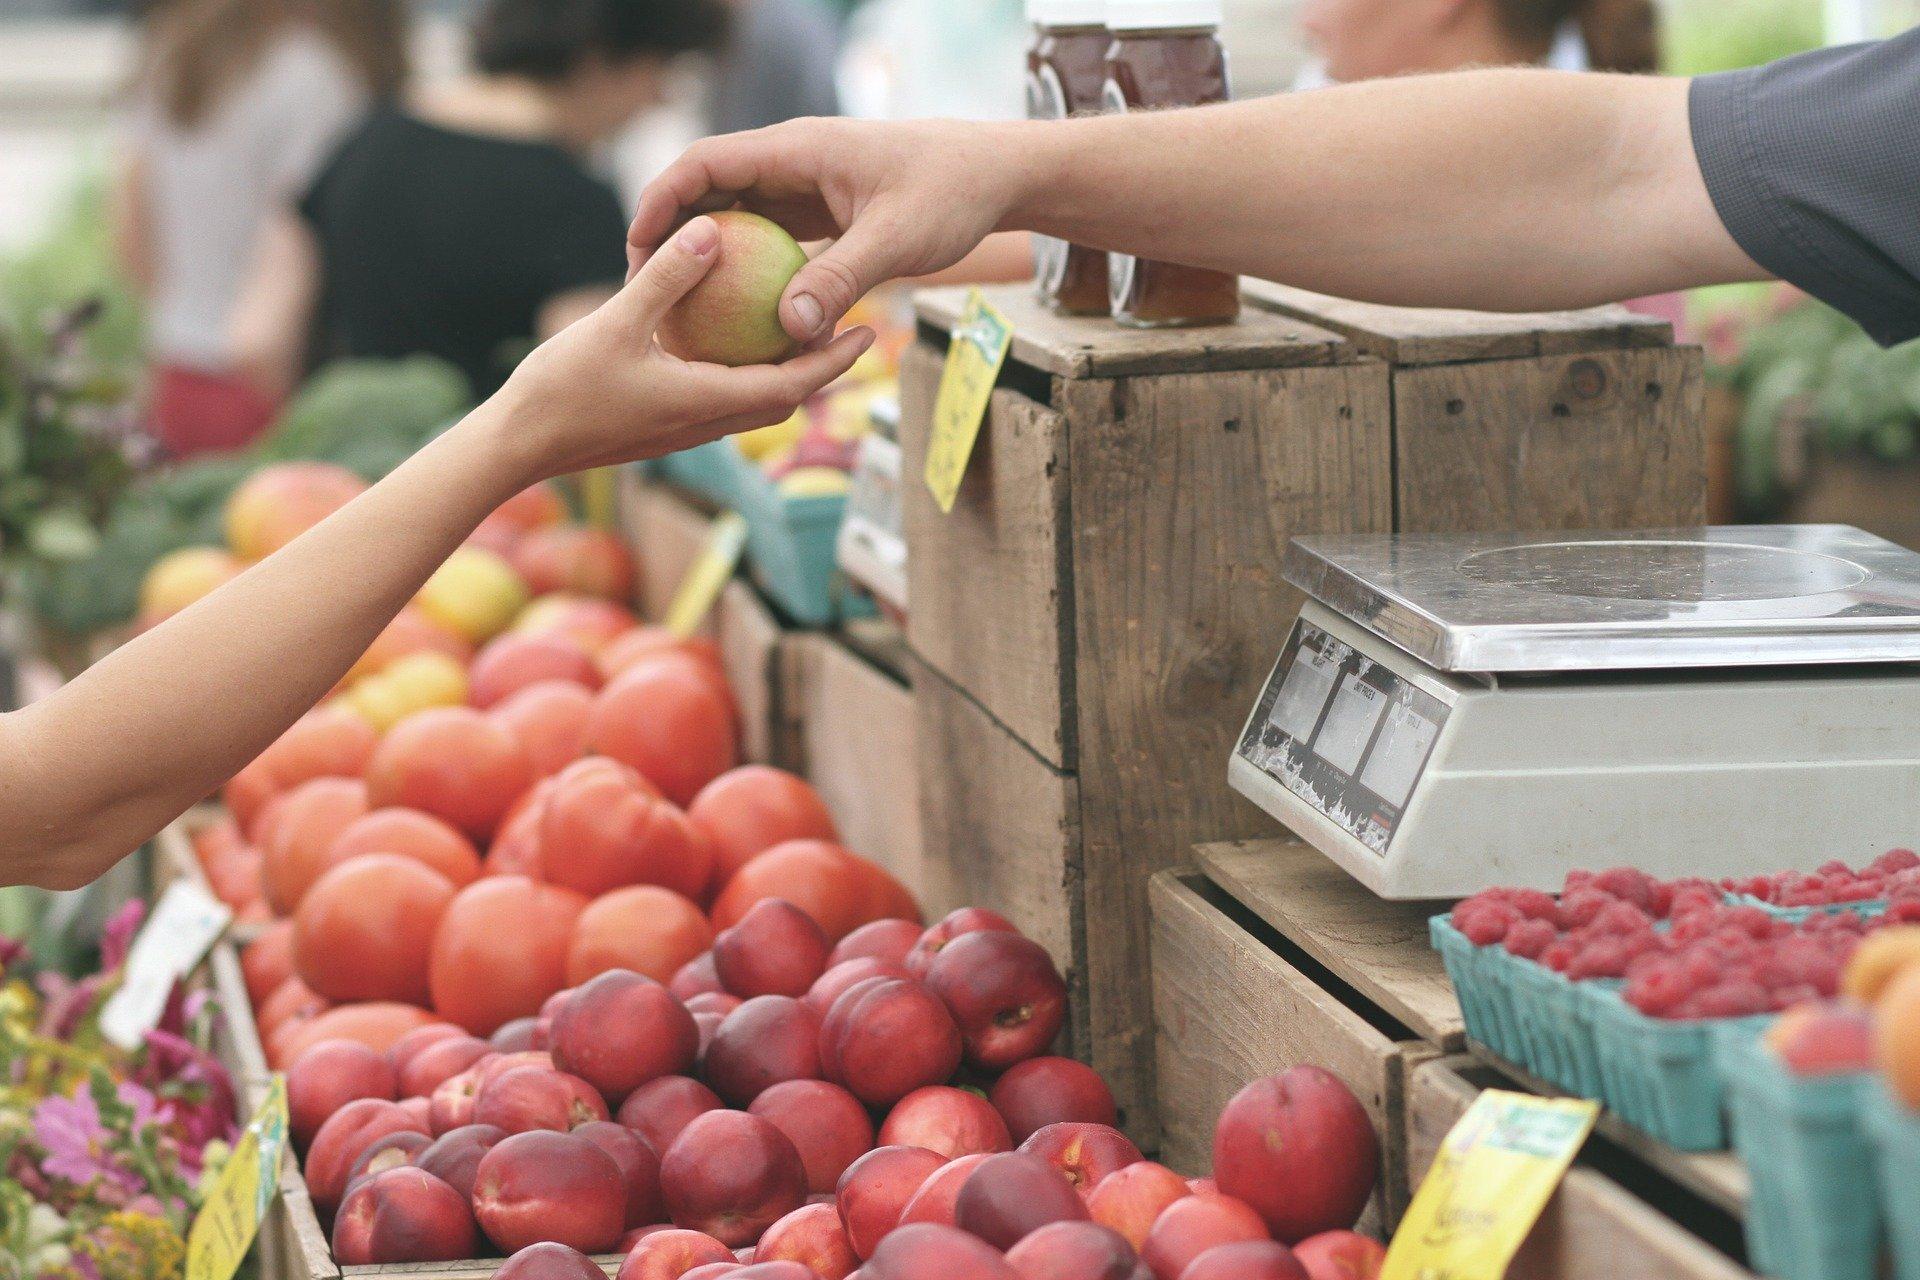 apples-1841132_1920.jpg